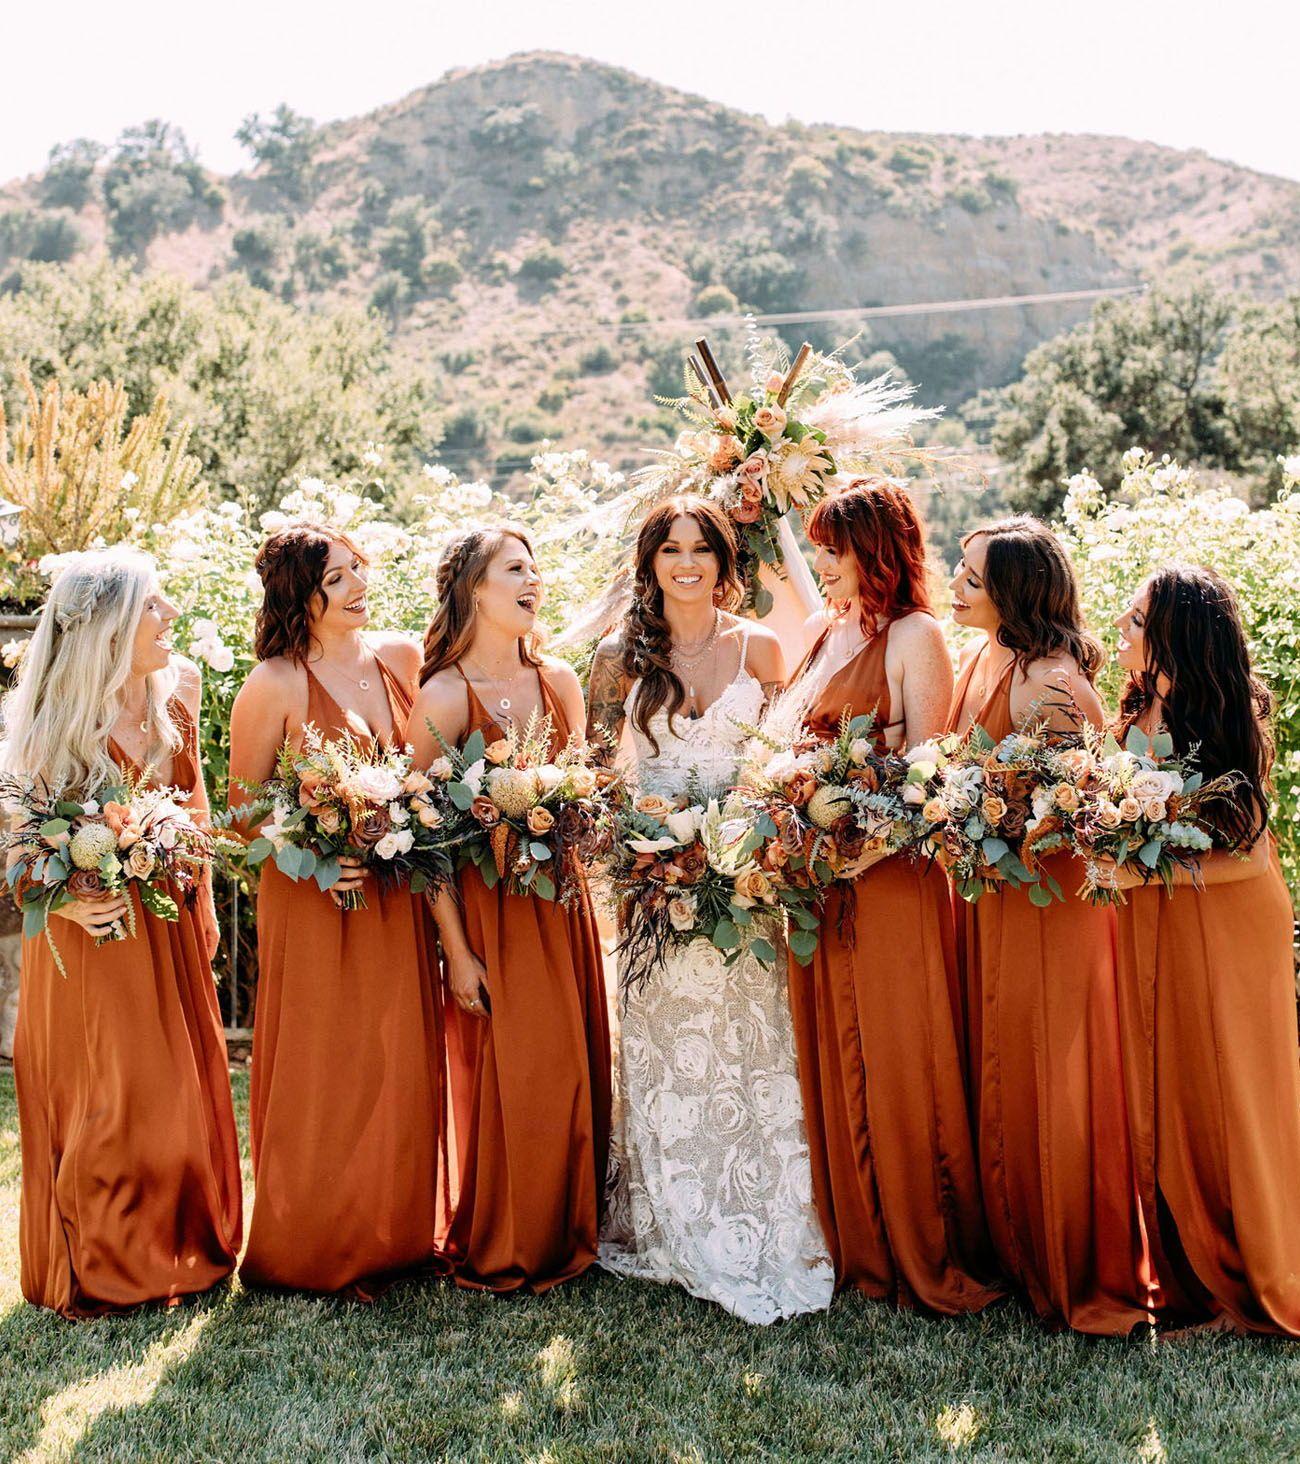 Burnt Orange Bridesmaid Dresses You Must Look Rust Bridesmaid Dress Burnt Orange Bridesmaid Dresses Orange Bridesmaid Dresses [ 1464 x 1300 Pixel ]